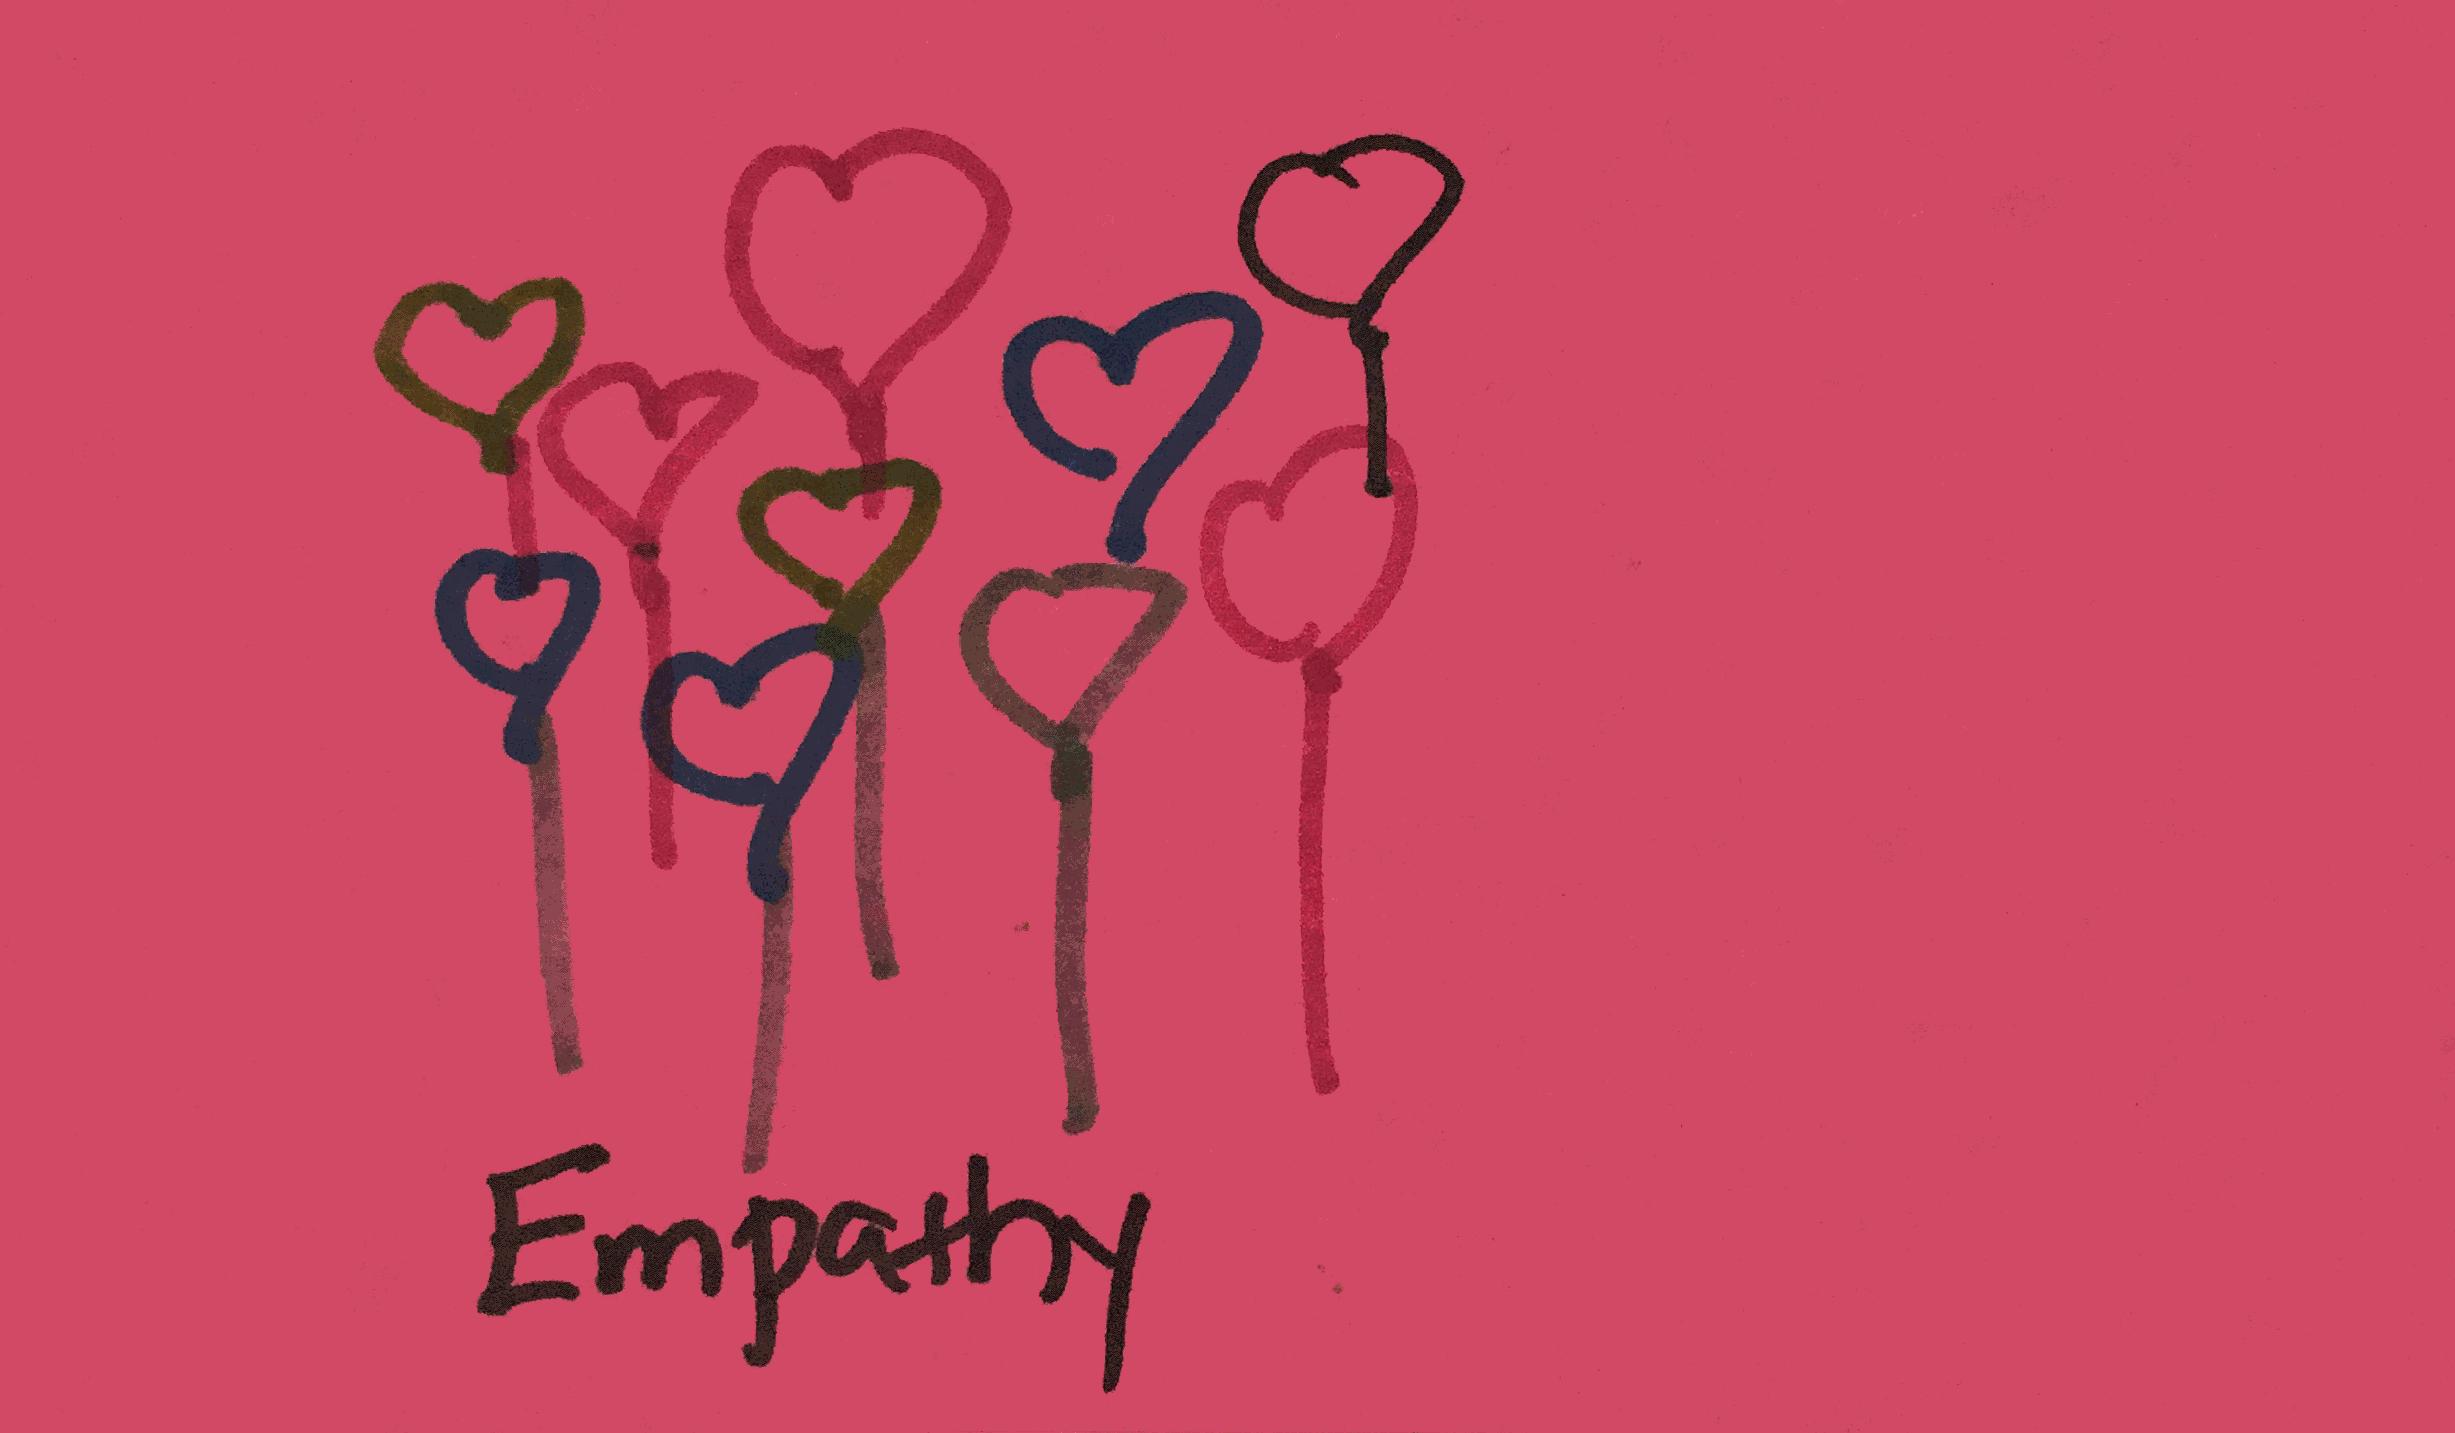 strengthsfinder-singapore-strengths-school-empathy-2